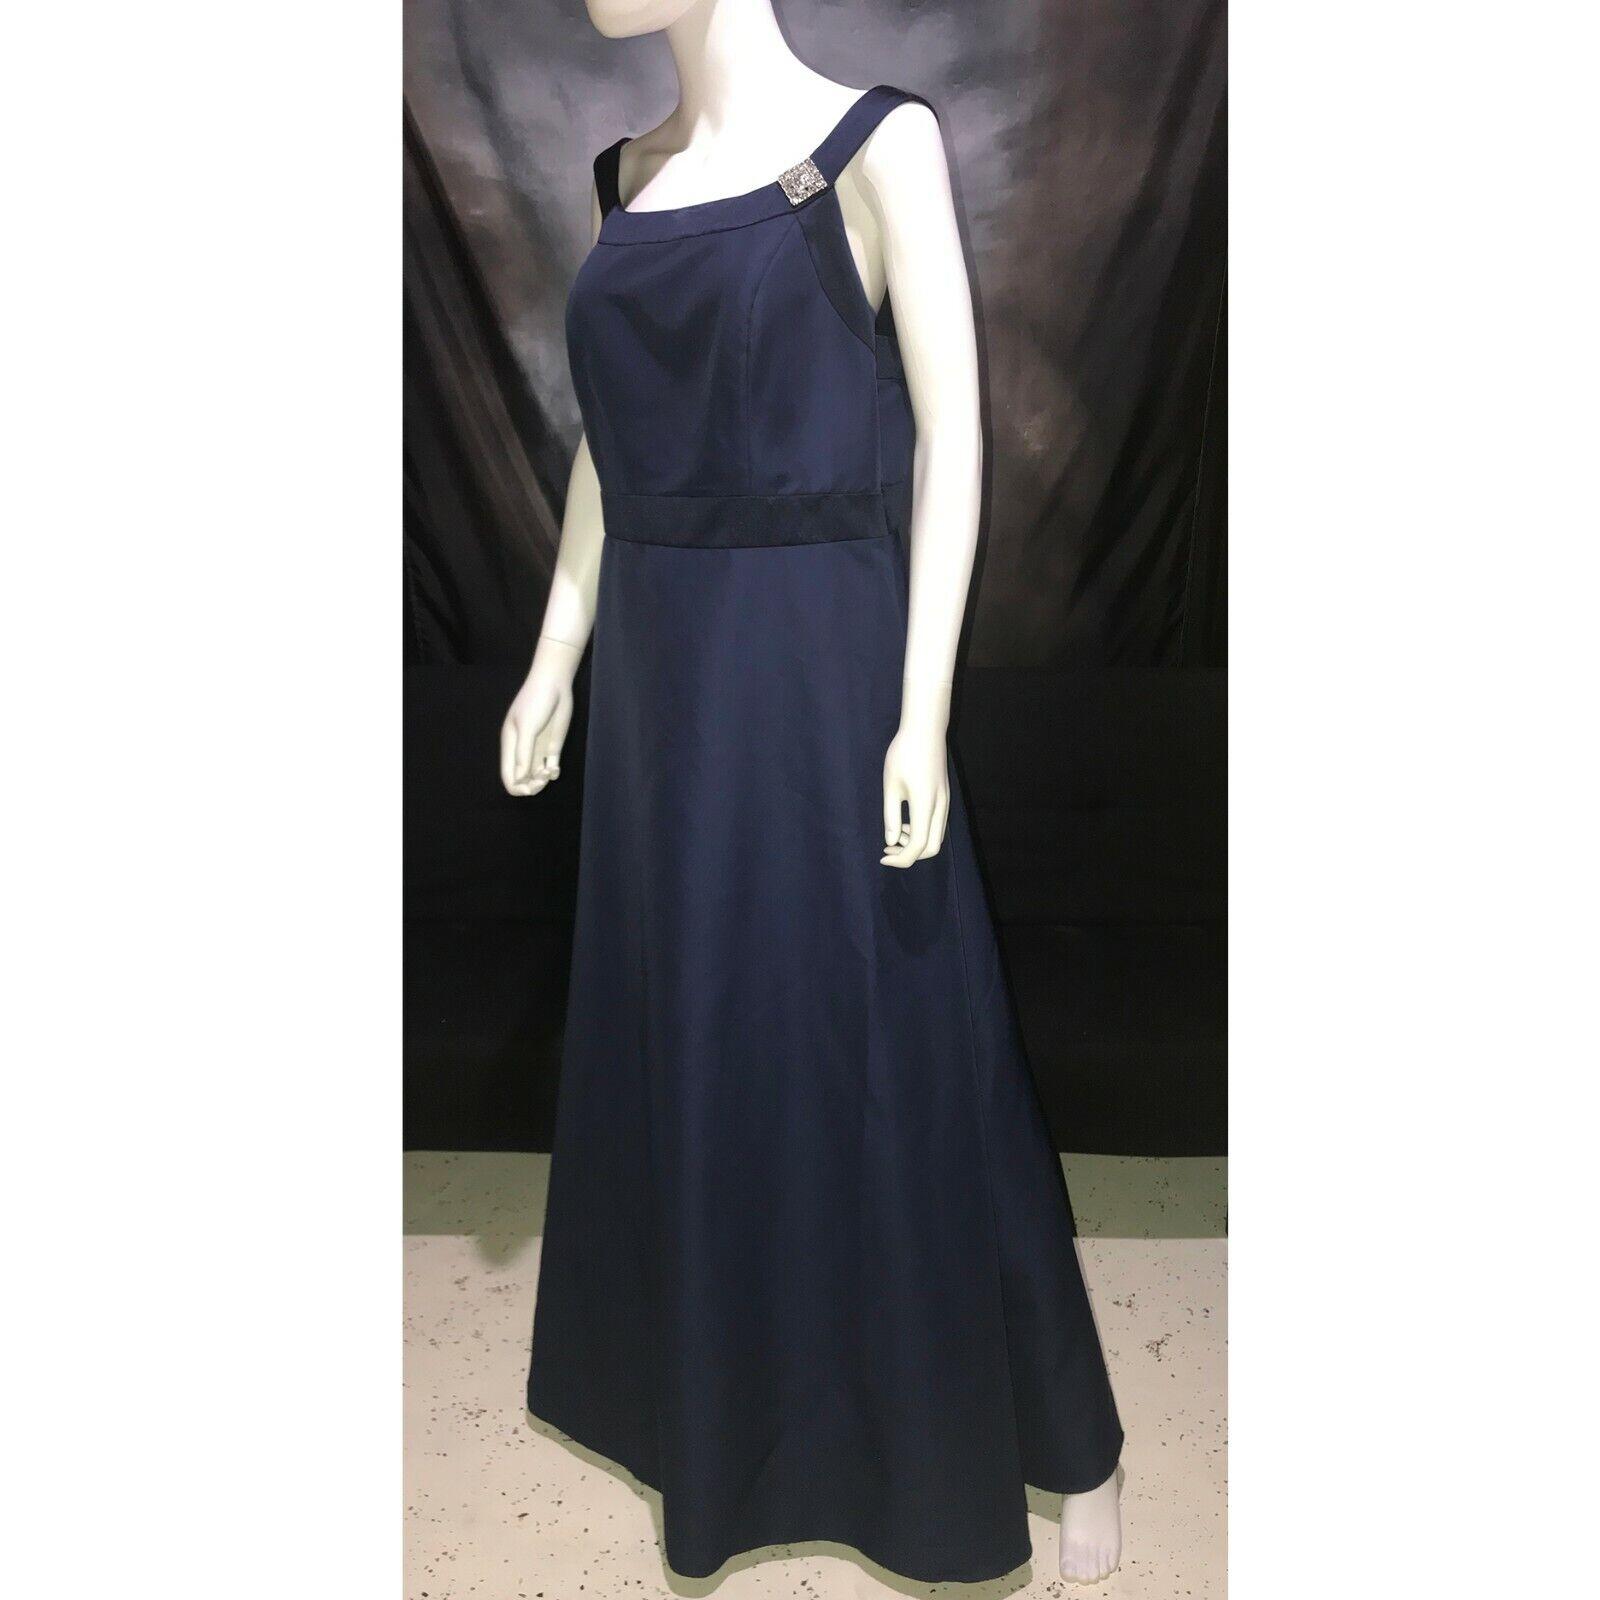 DAVID'S BRIDAL Navy Satin Full Formal Gown Prom Dress Plus Sz 16 #81457AC